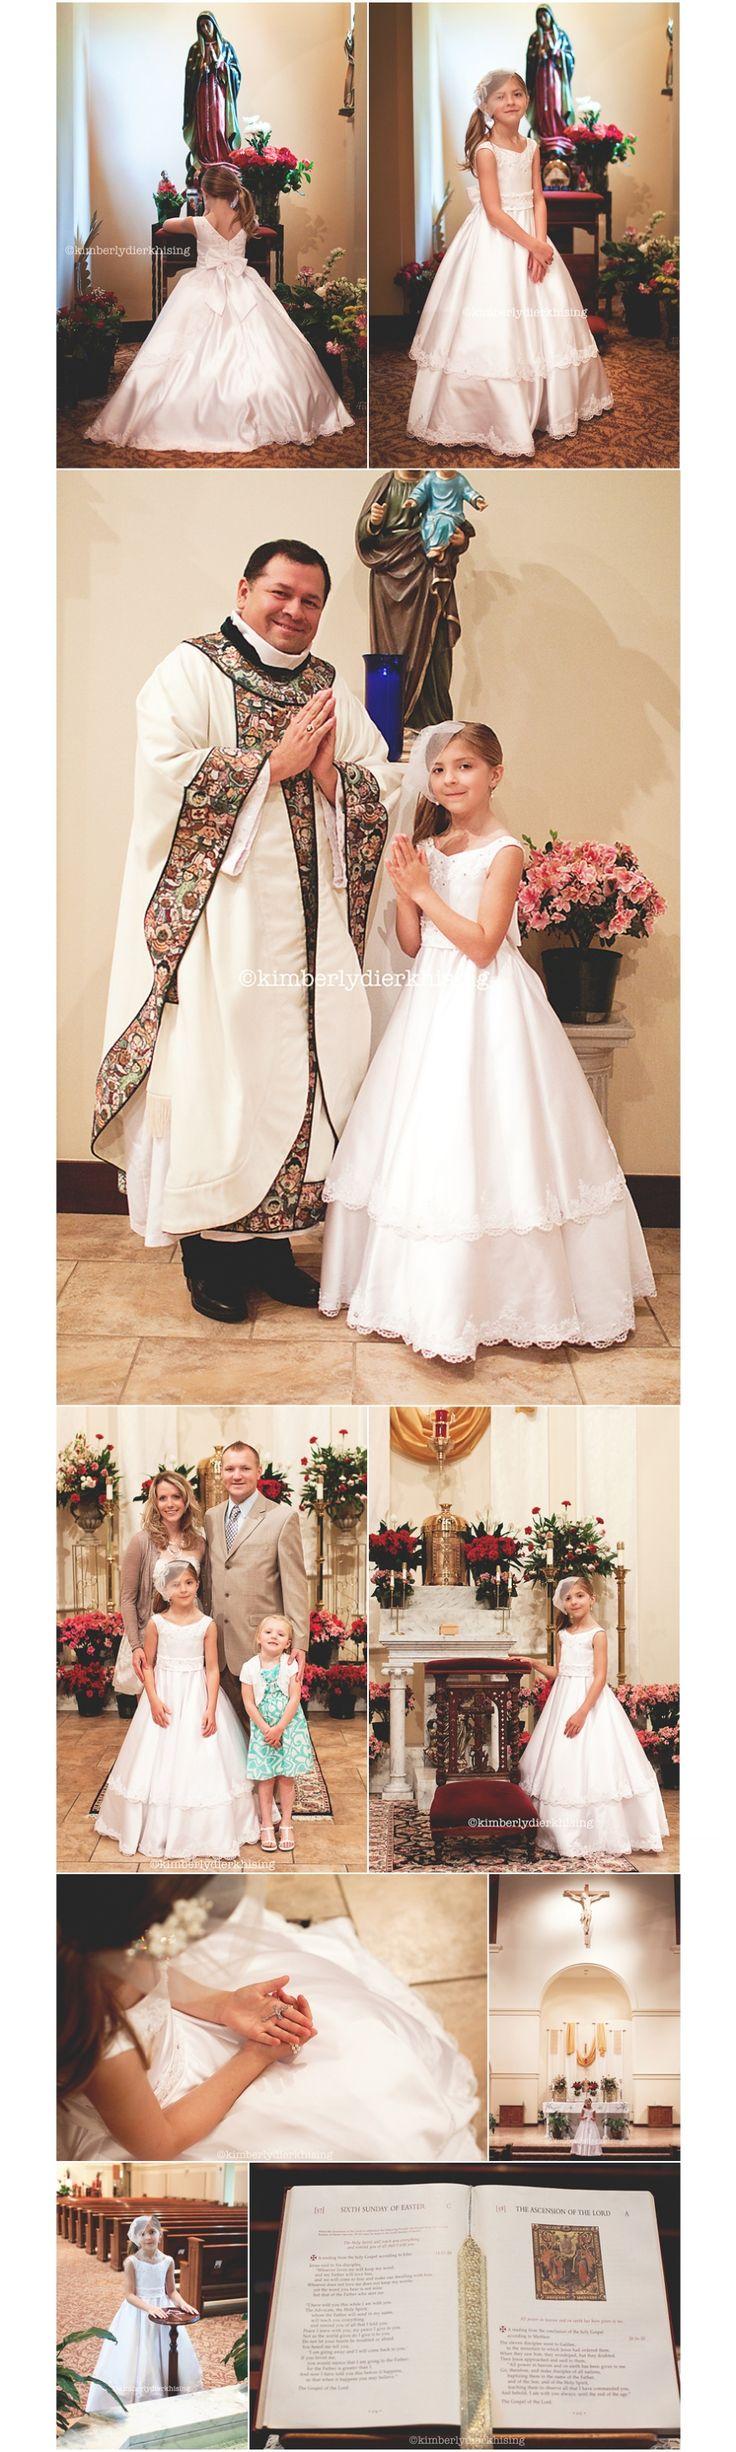 Kimberly Dierkhising Photography » Blog #first communion